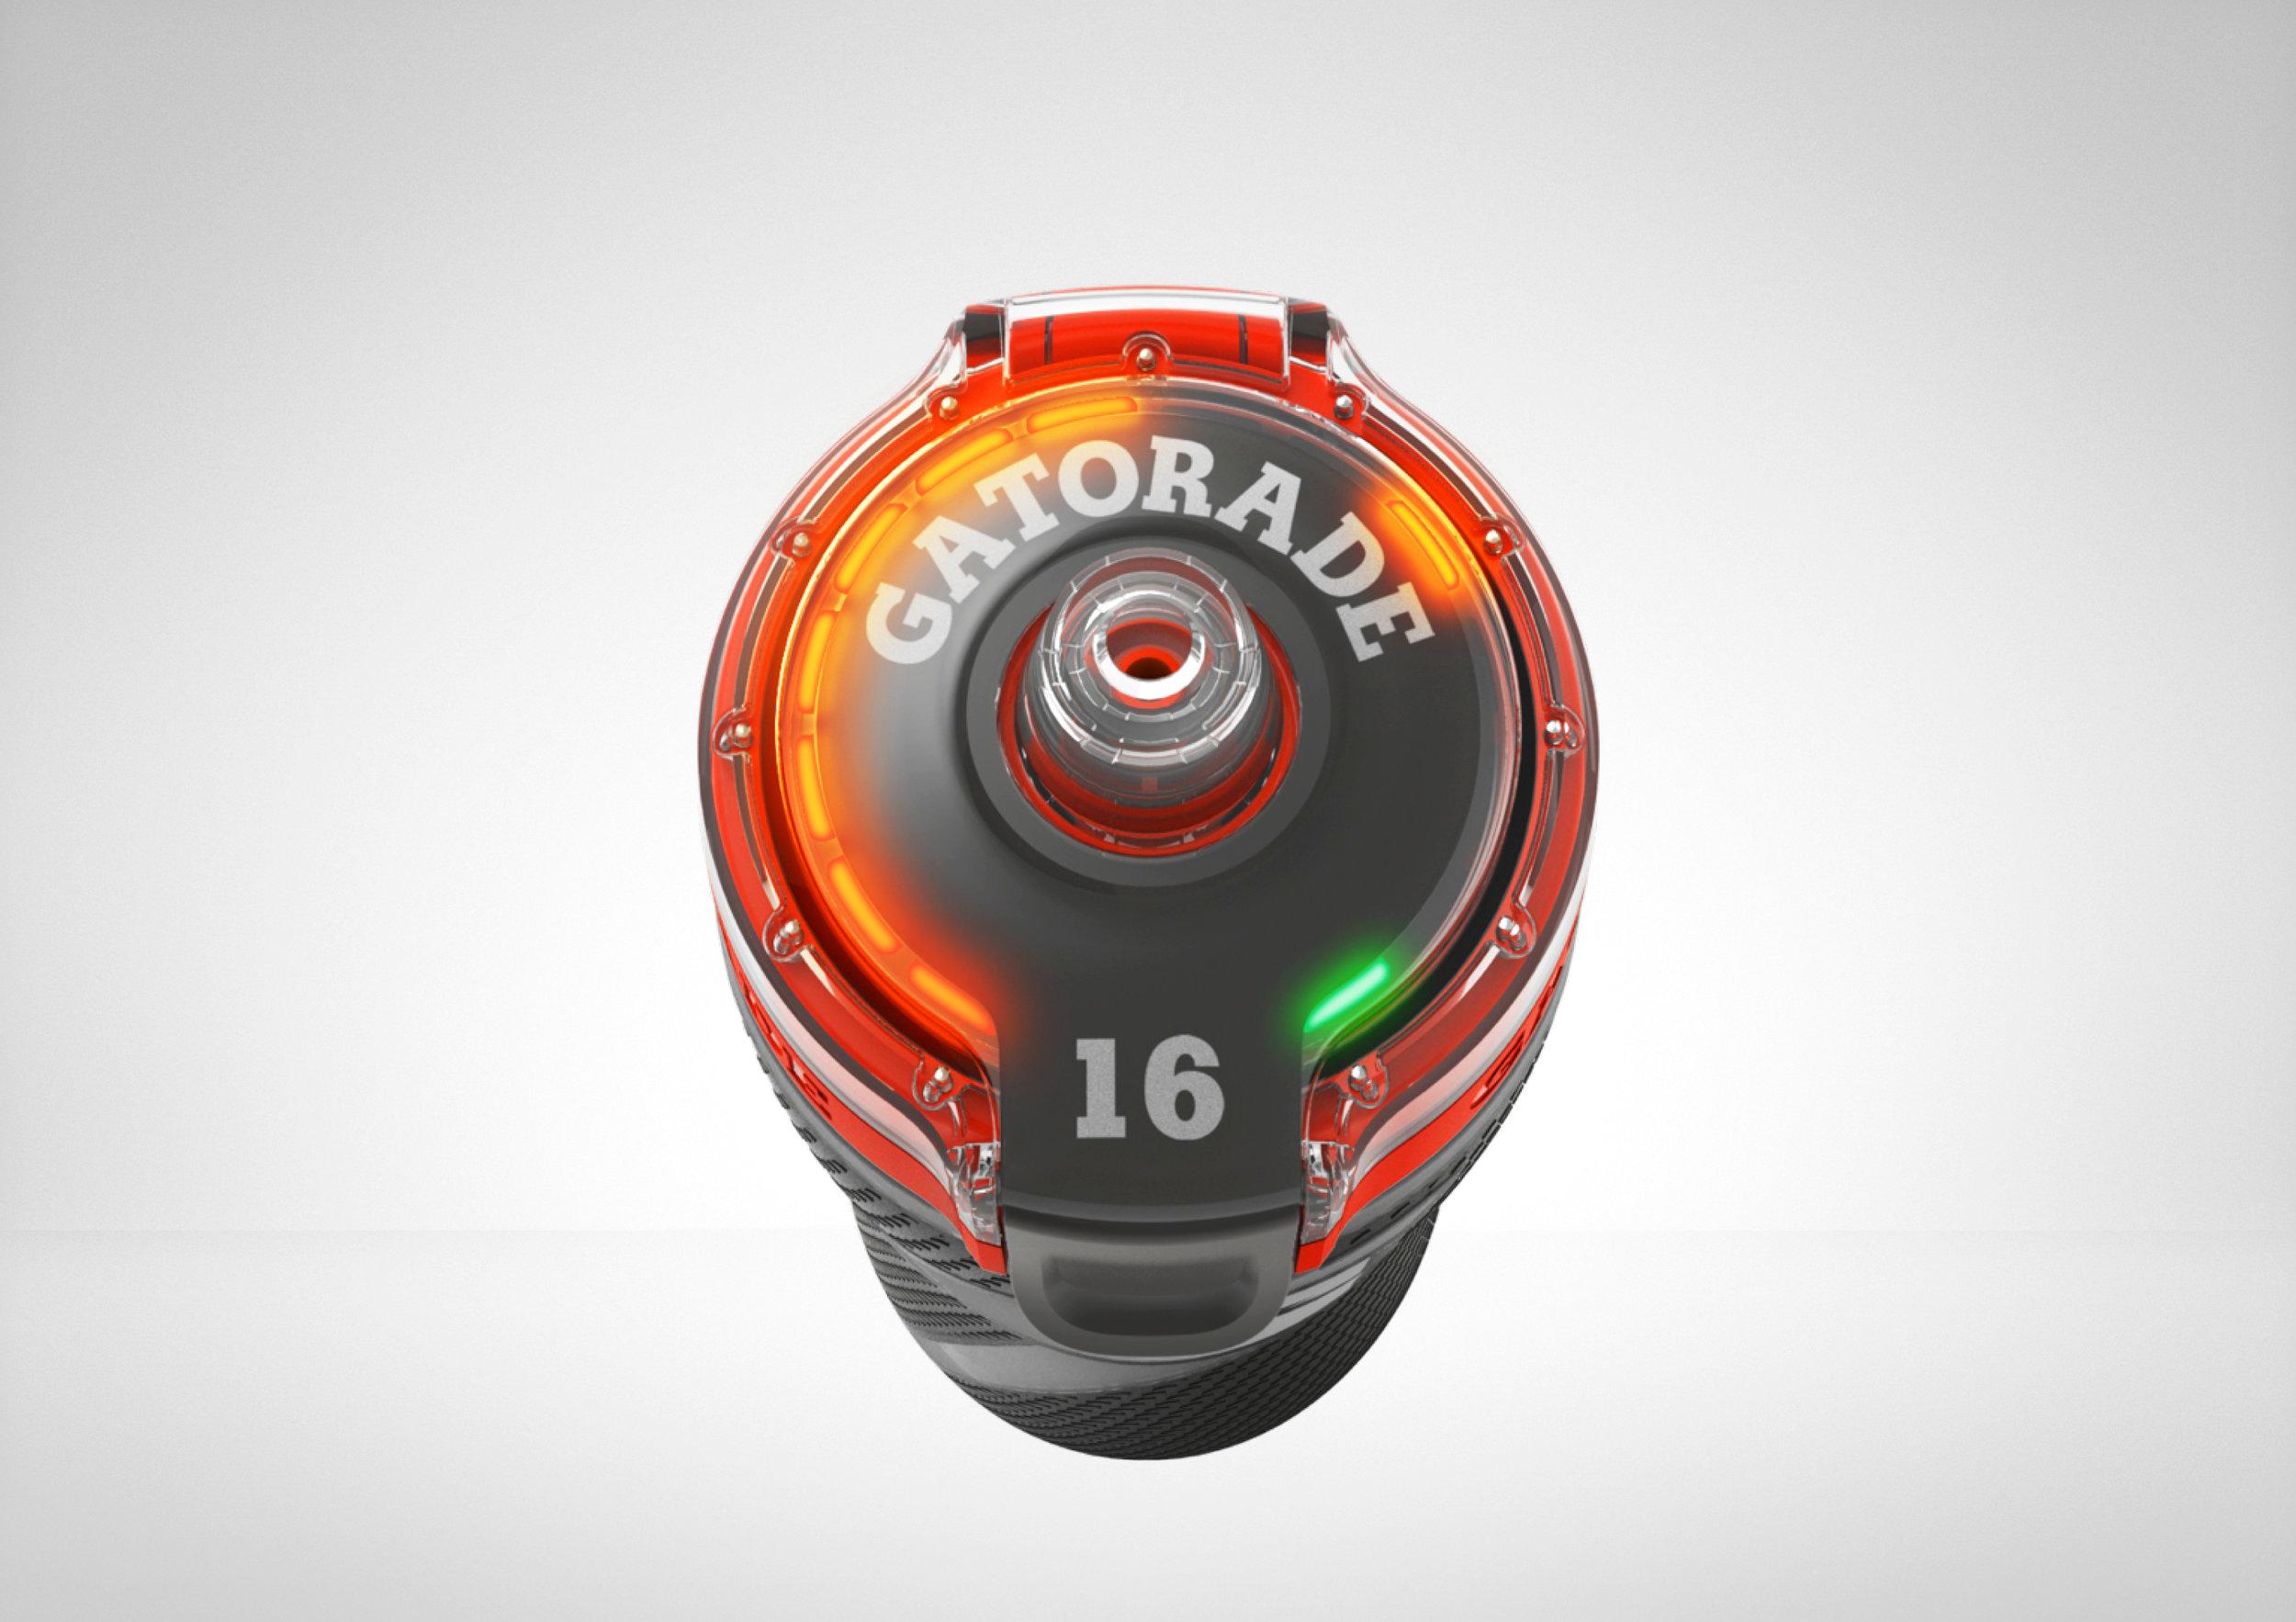 Product Design Gatorade Designwell